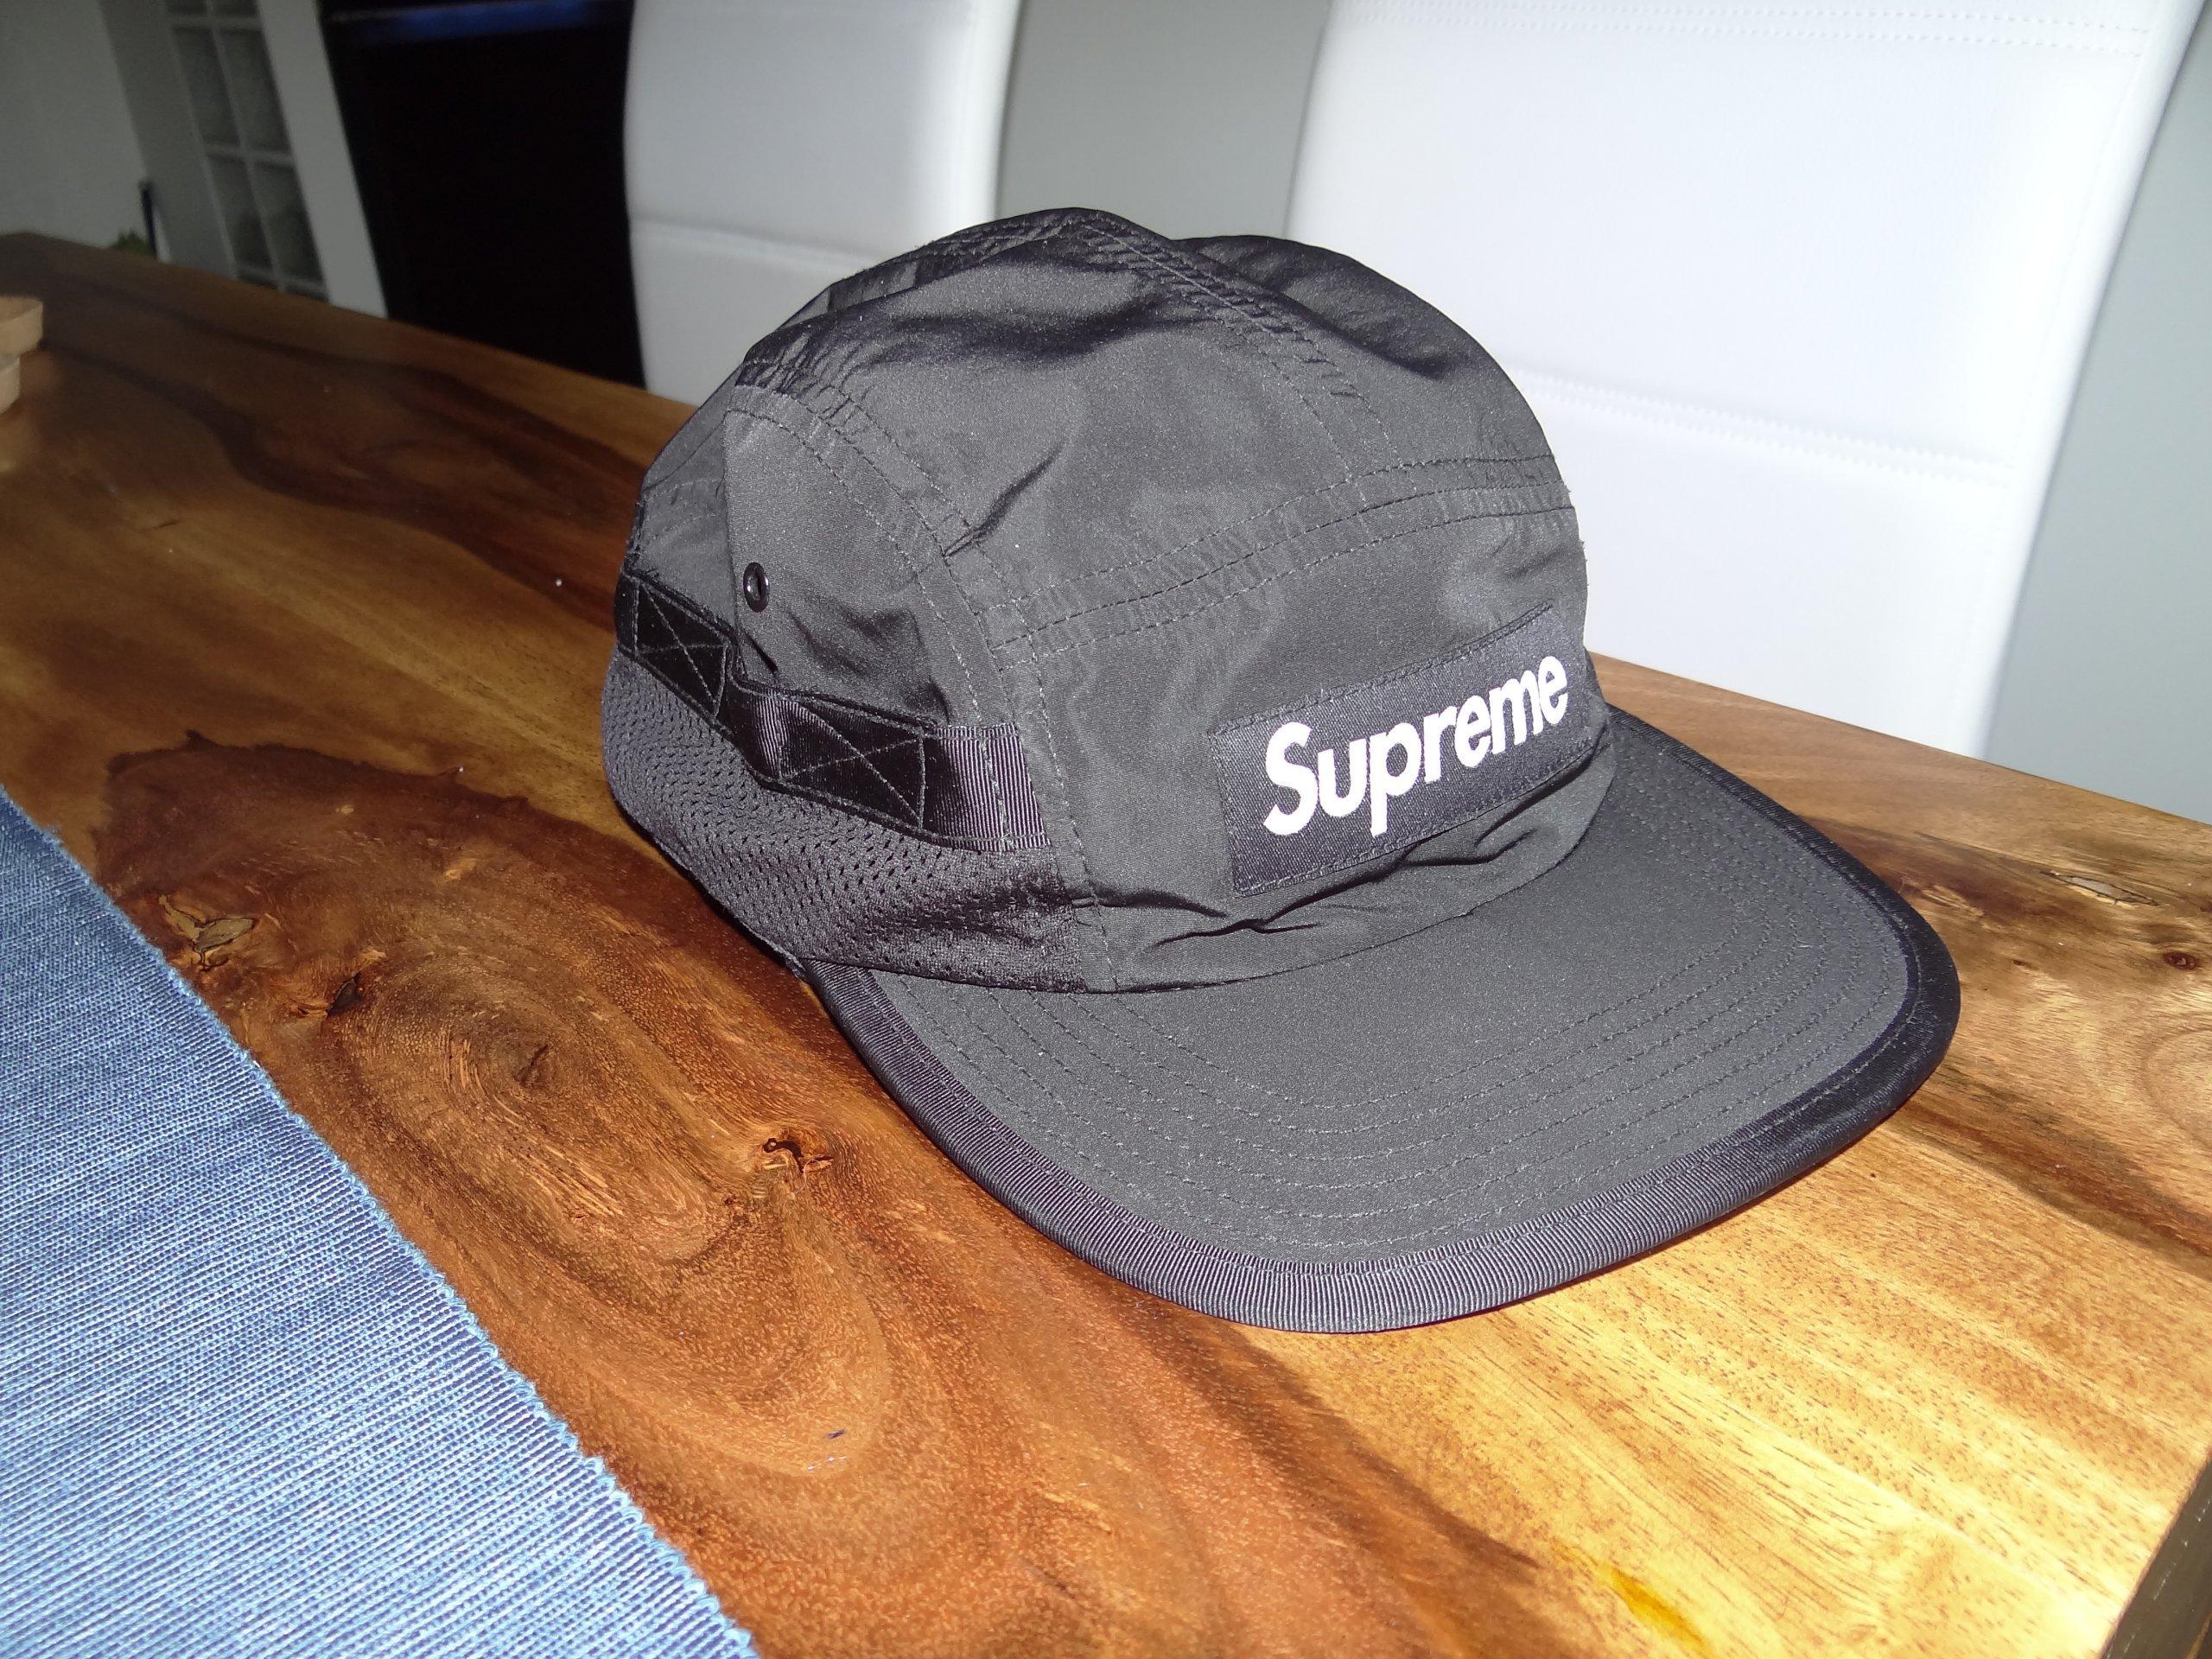 ec8a730bc8e Supreme box logo black side mesh pocket 5 panel - 7277356869 ...